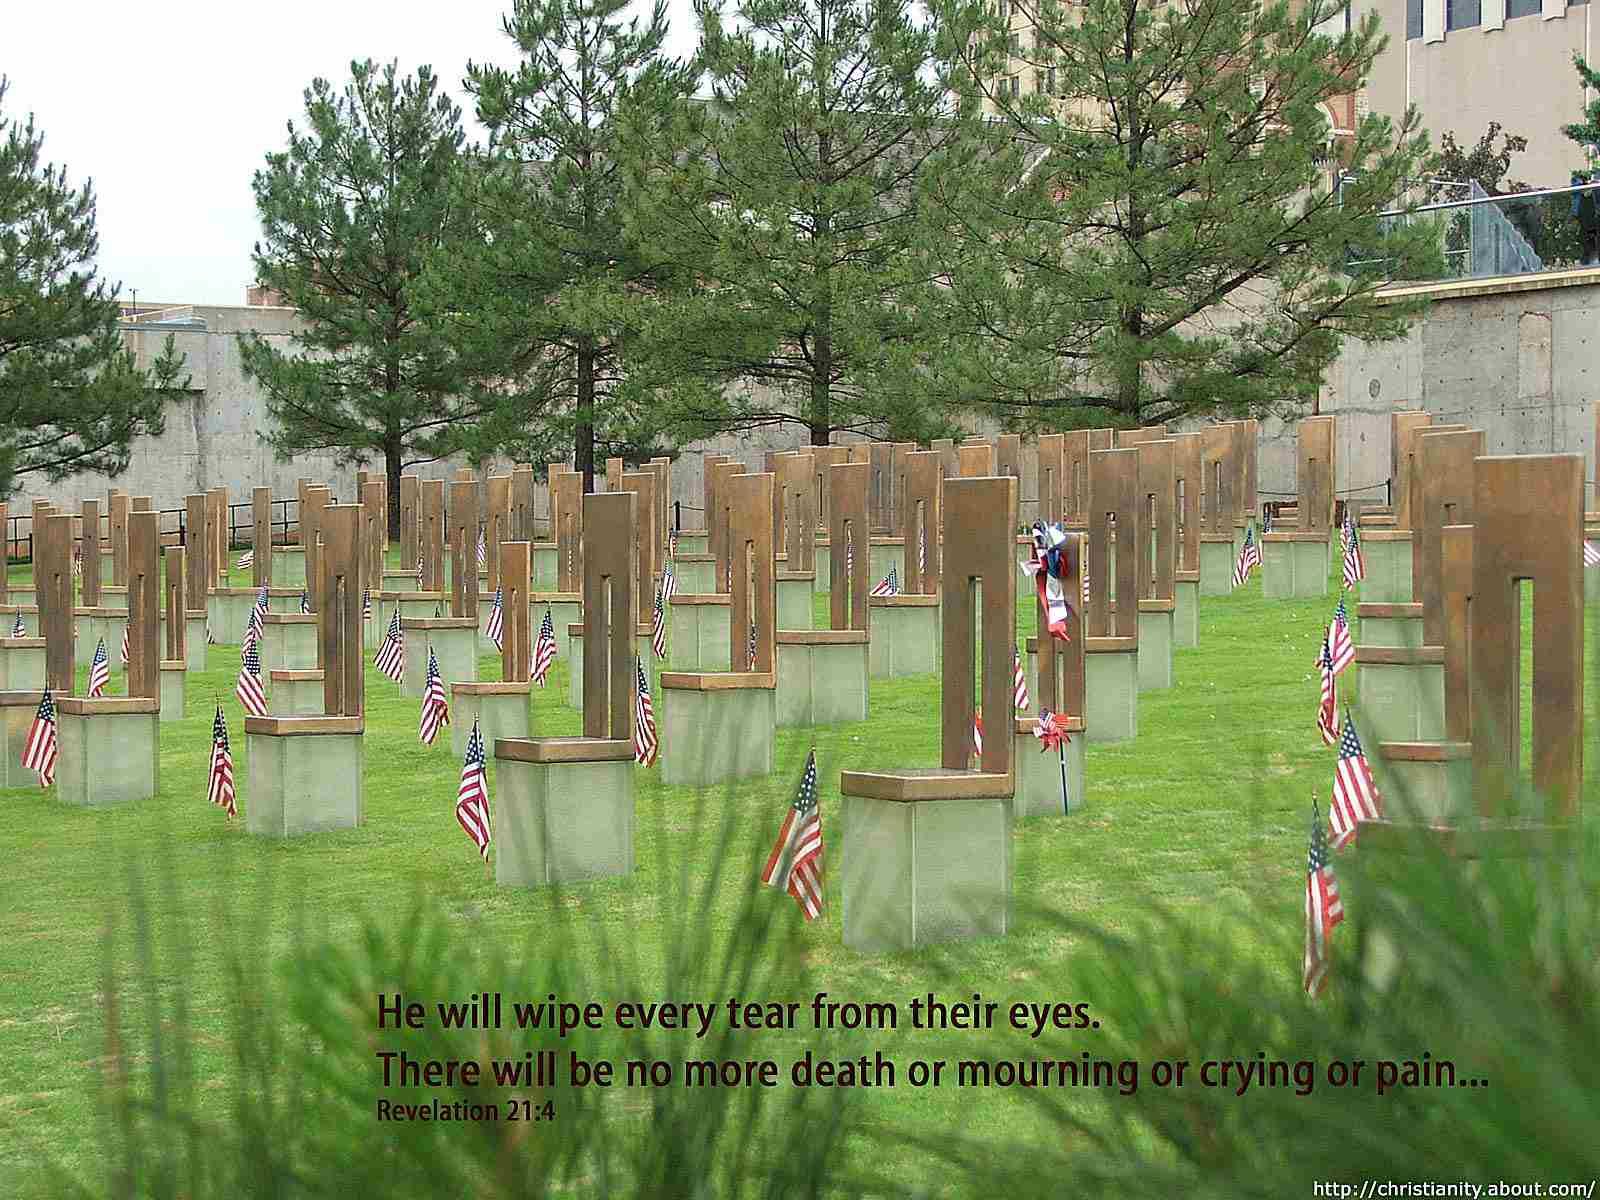 Oklahoma City Bombing Memorial with bible verse